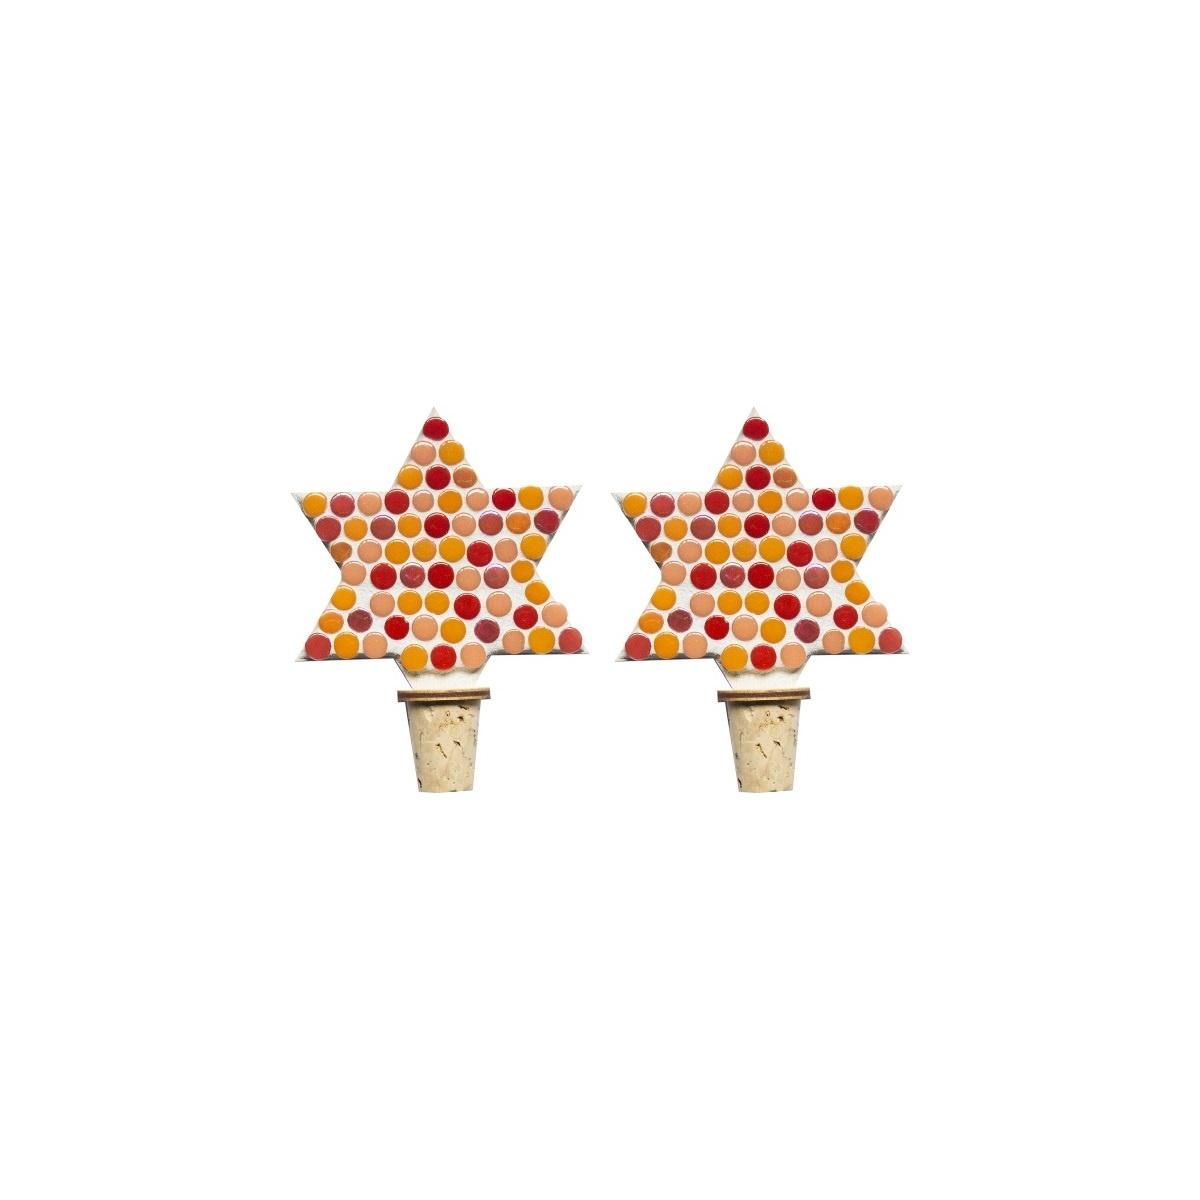 Flessenstop set/2 Ster Rood-oranjetinten